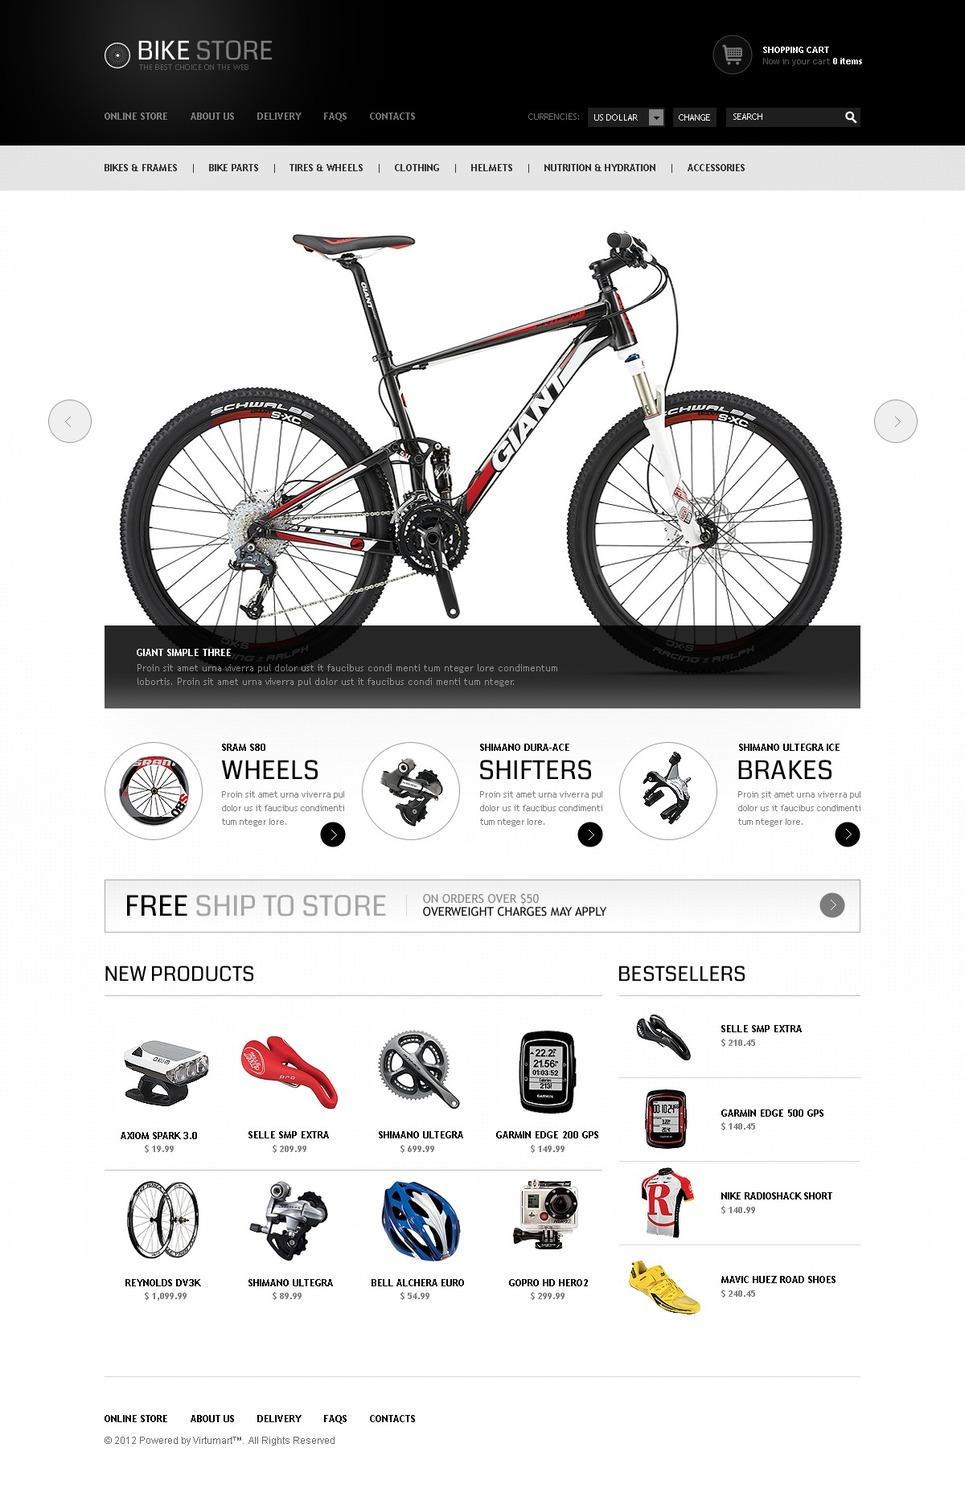 bikes for everyone virtuemart template web design templates website templates download bikes. Black Bedroom Furniture Sets. Home Design Ideas